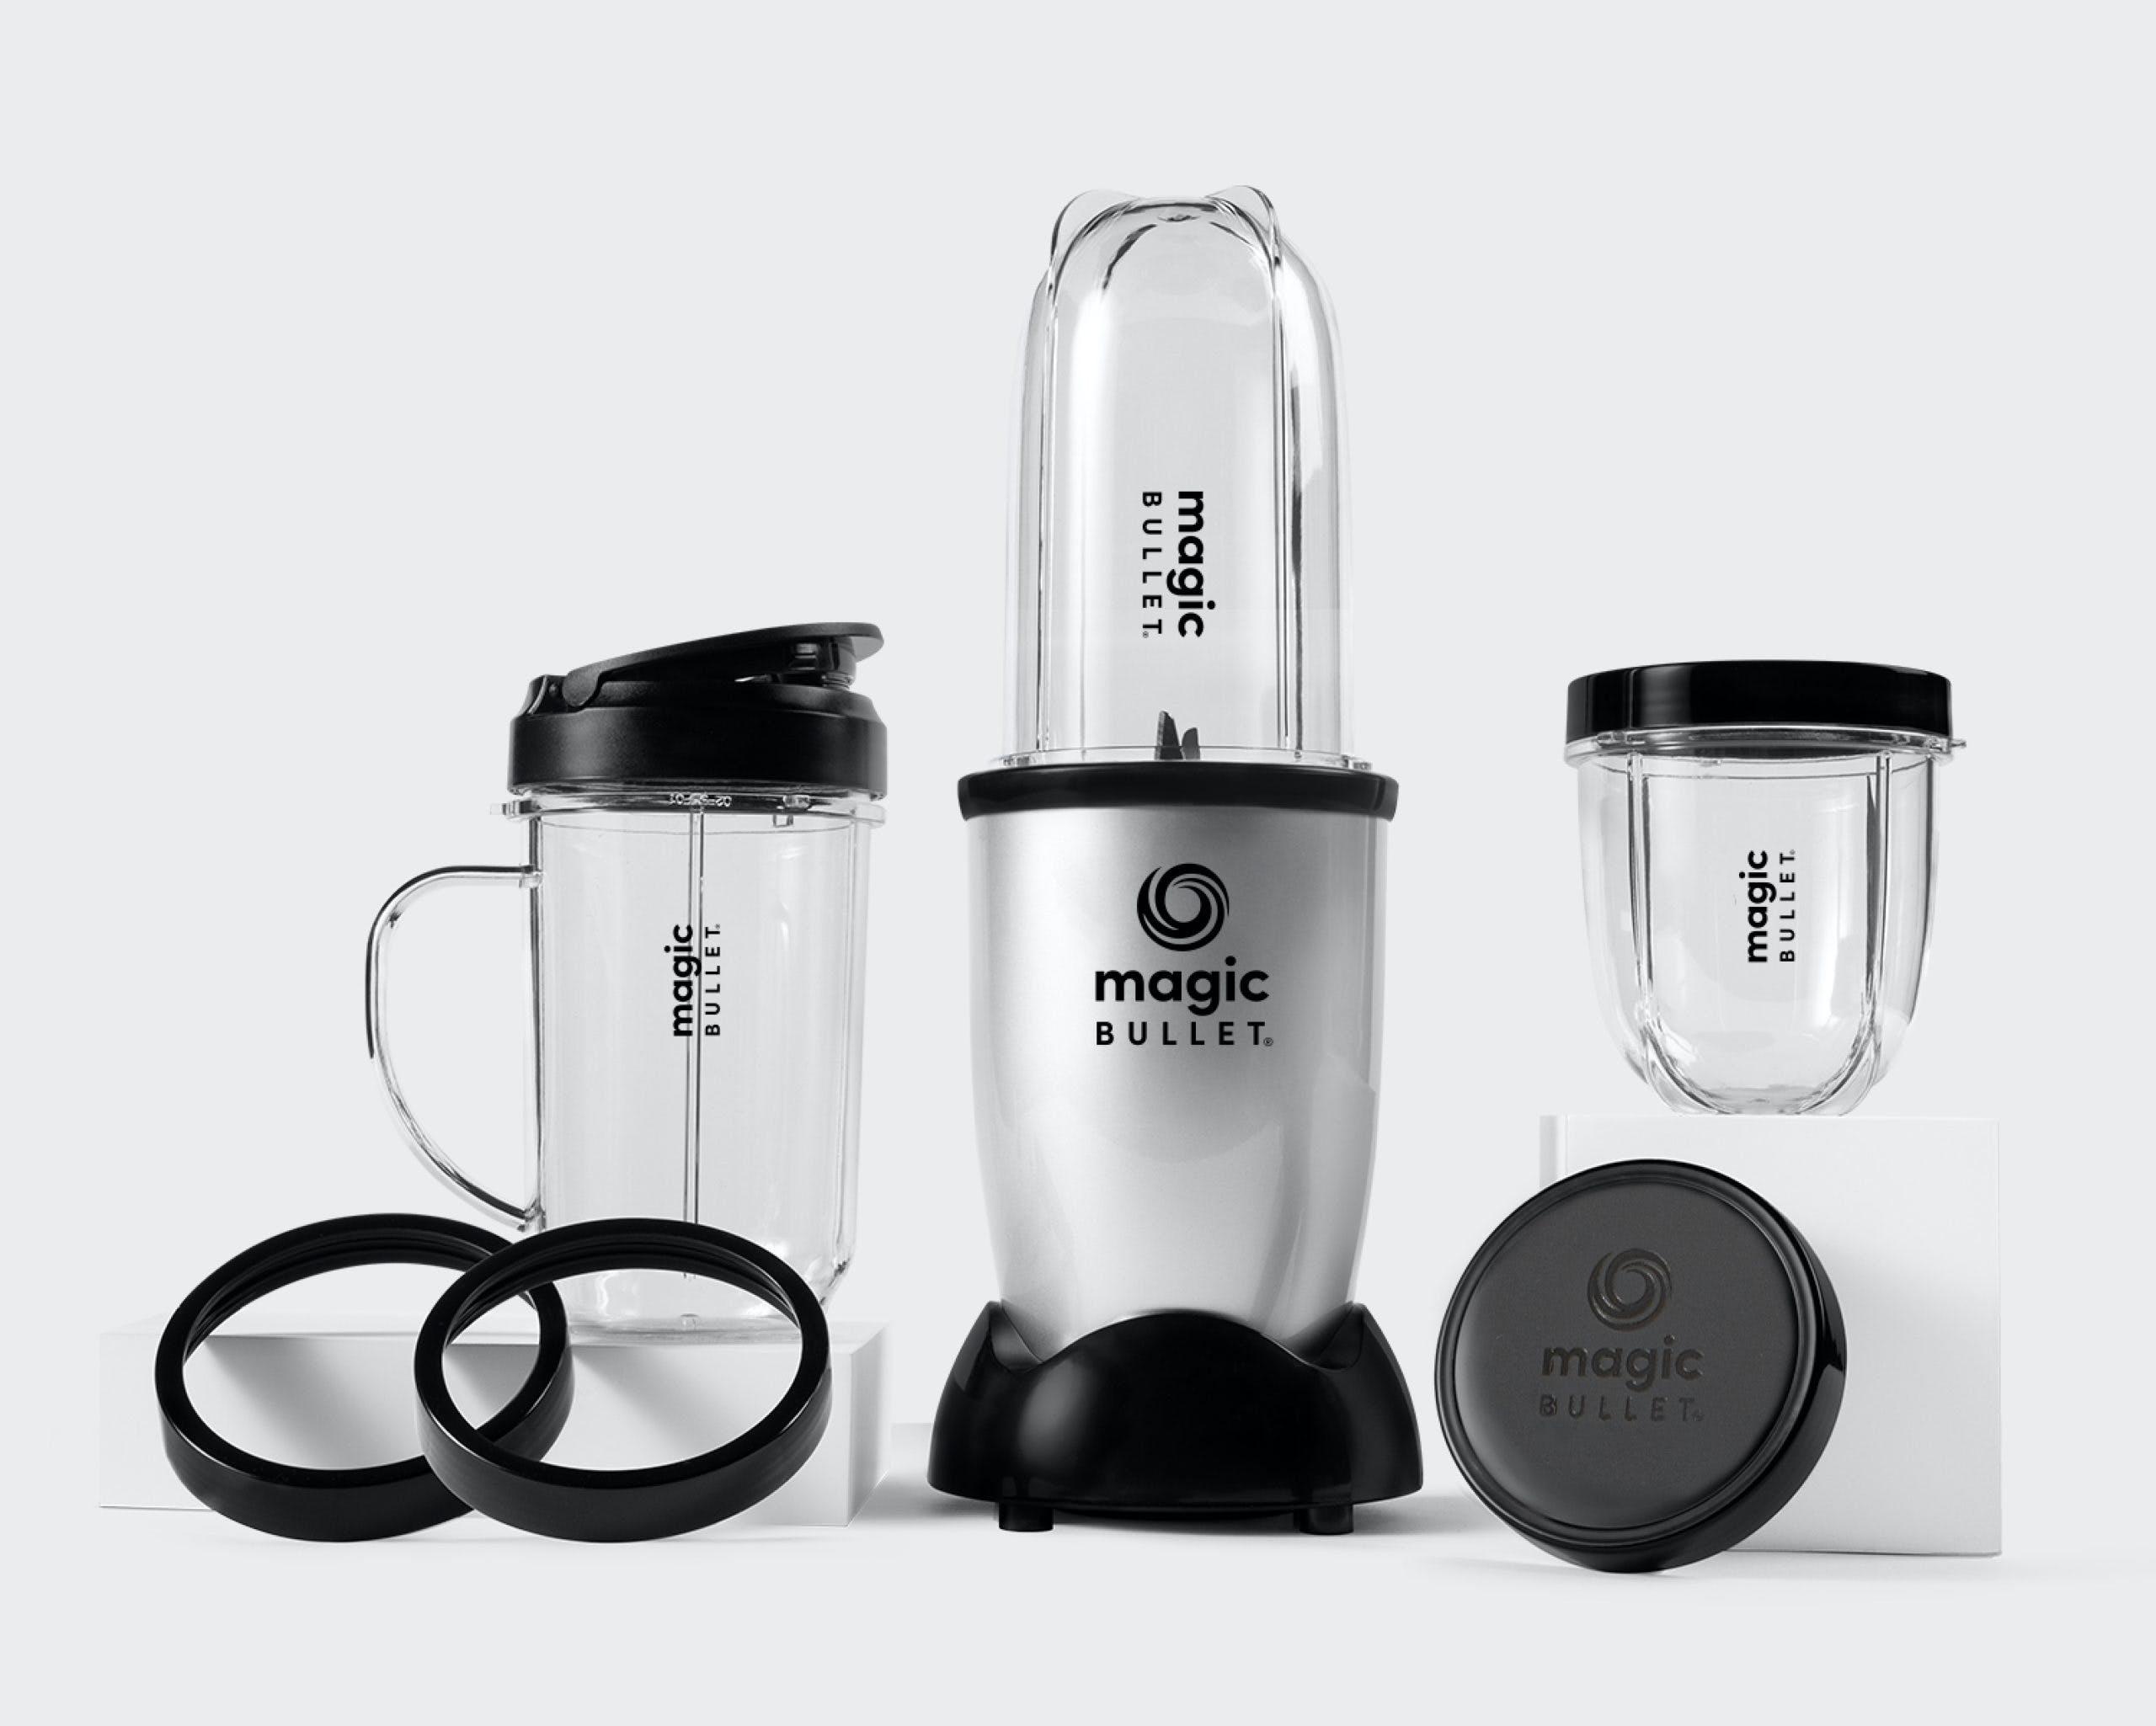 Blenpar Juicer Attachment Pitcher Compatible with MagicBullet Blenders